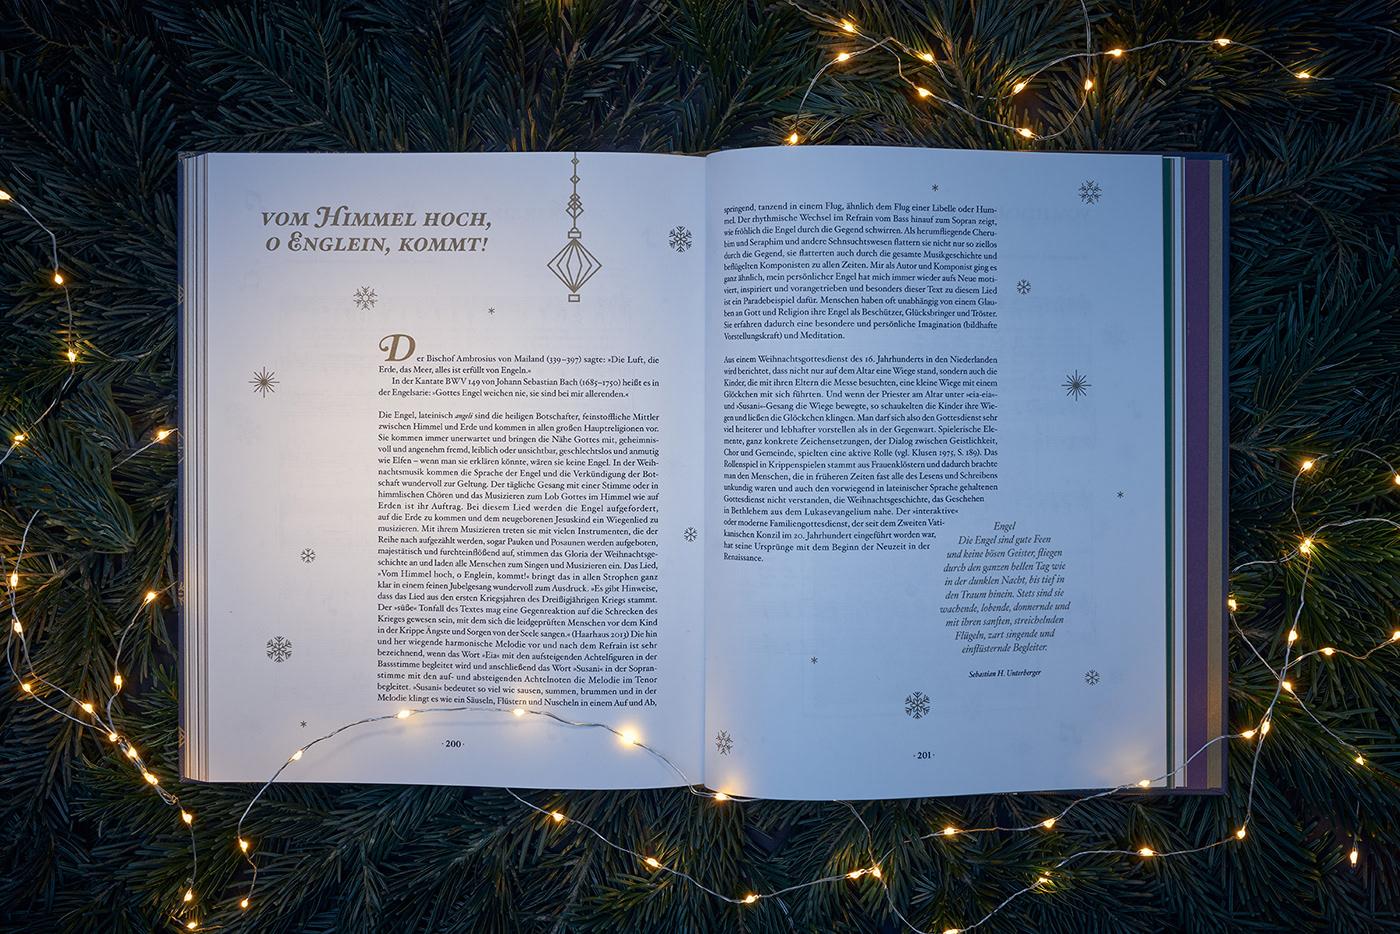 wirsindartisten Bookdesign Christmas christmasbook graphicdesign